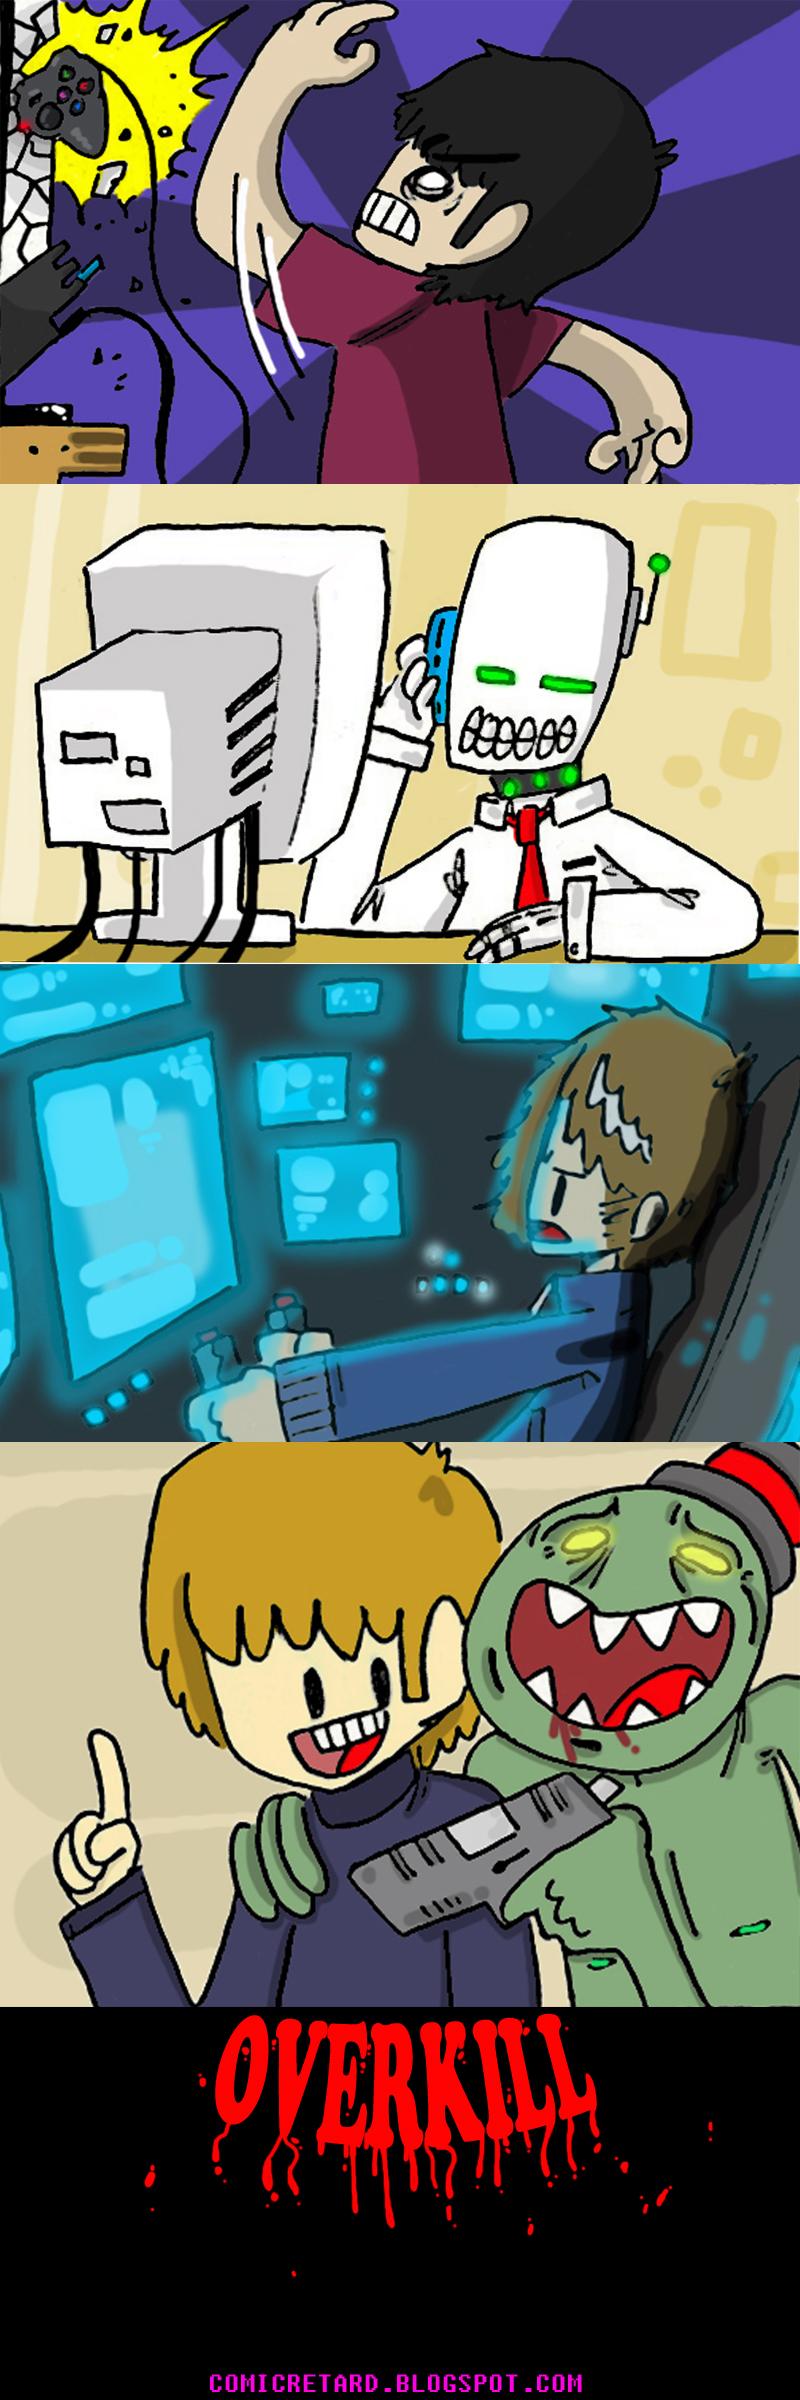 OverKill Comic Montage